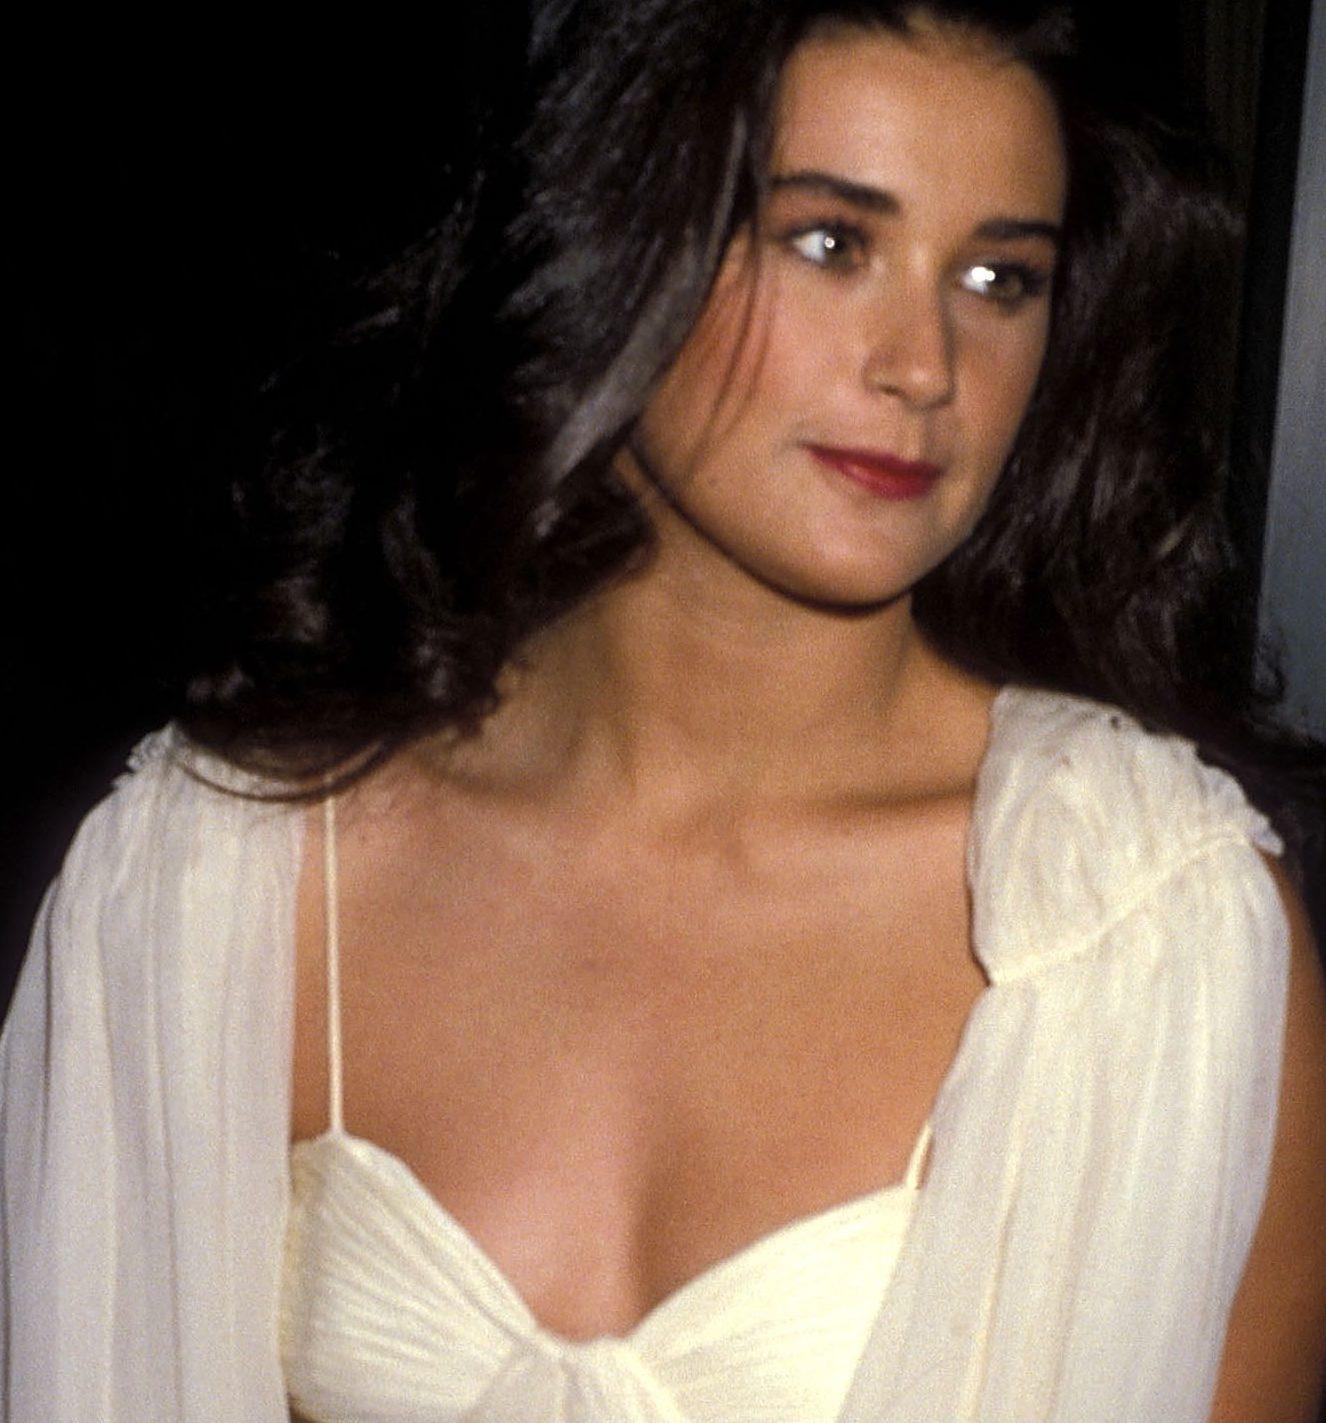 1984 Cream dress